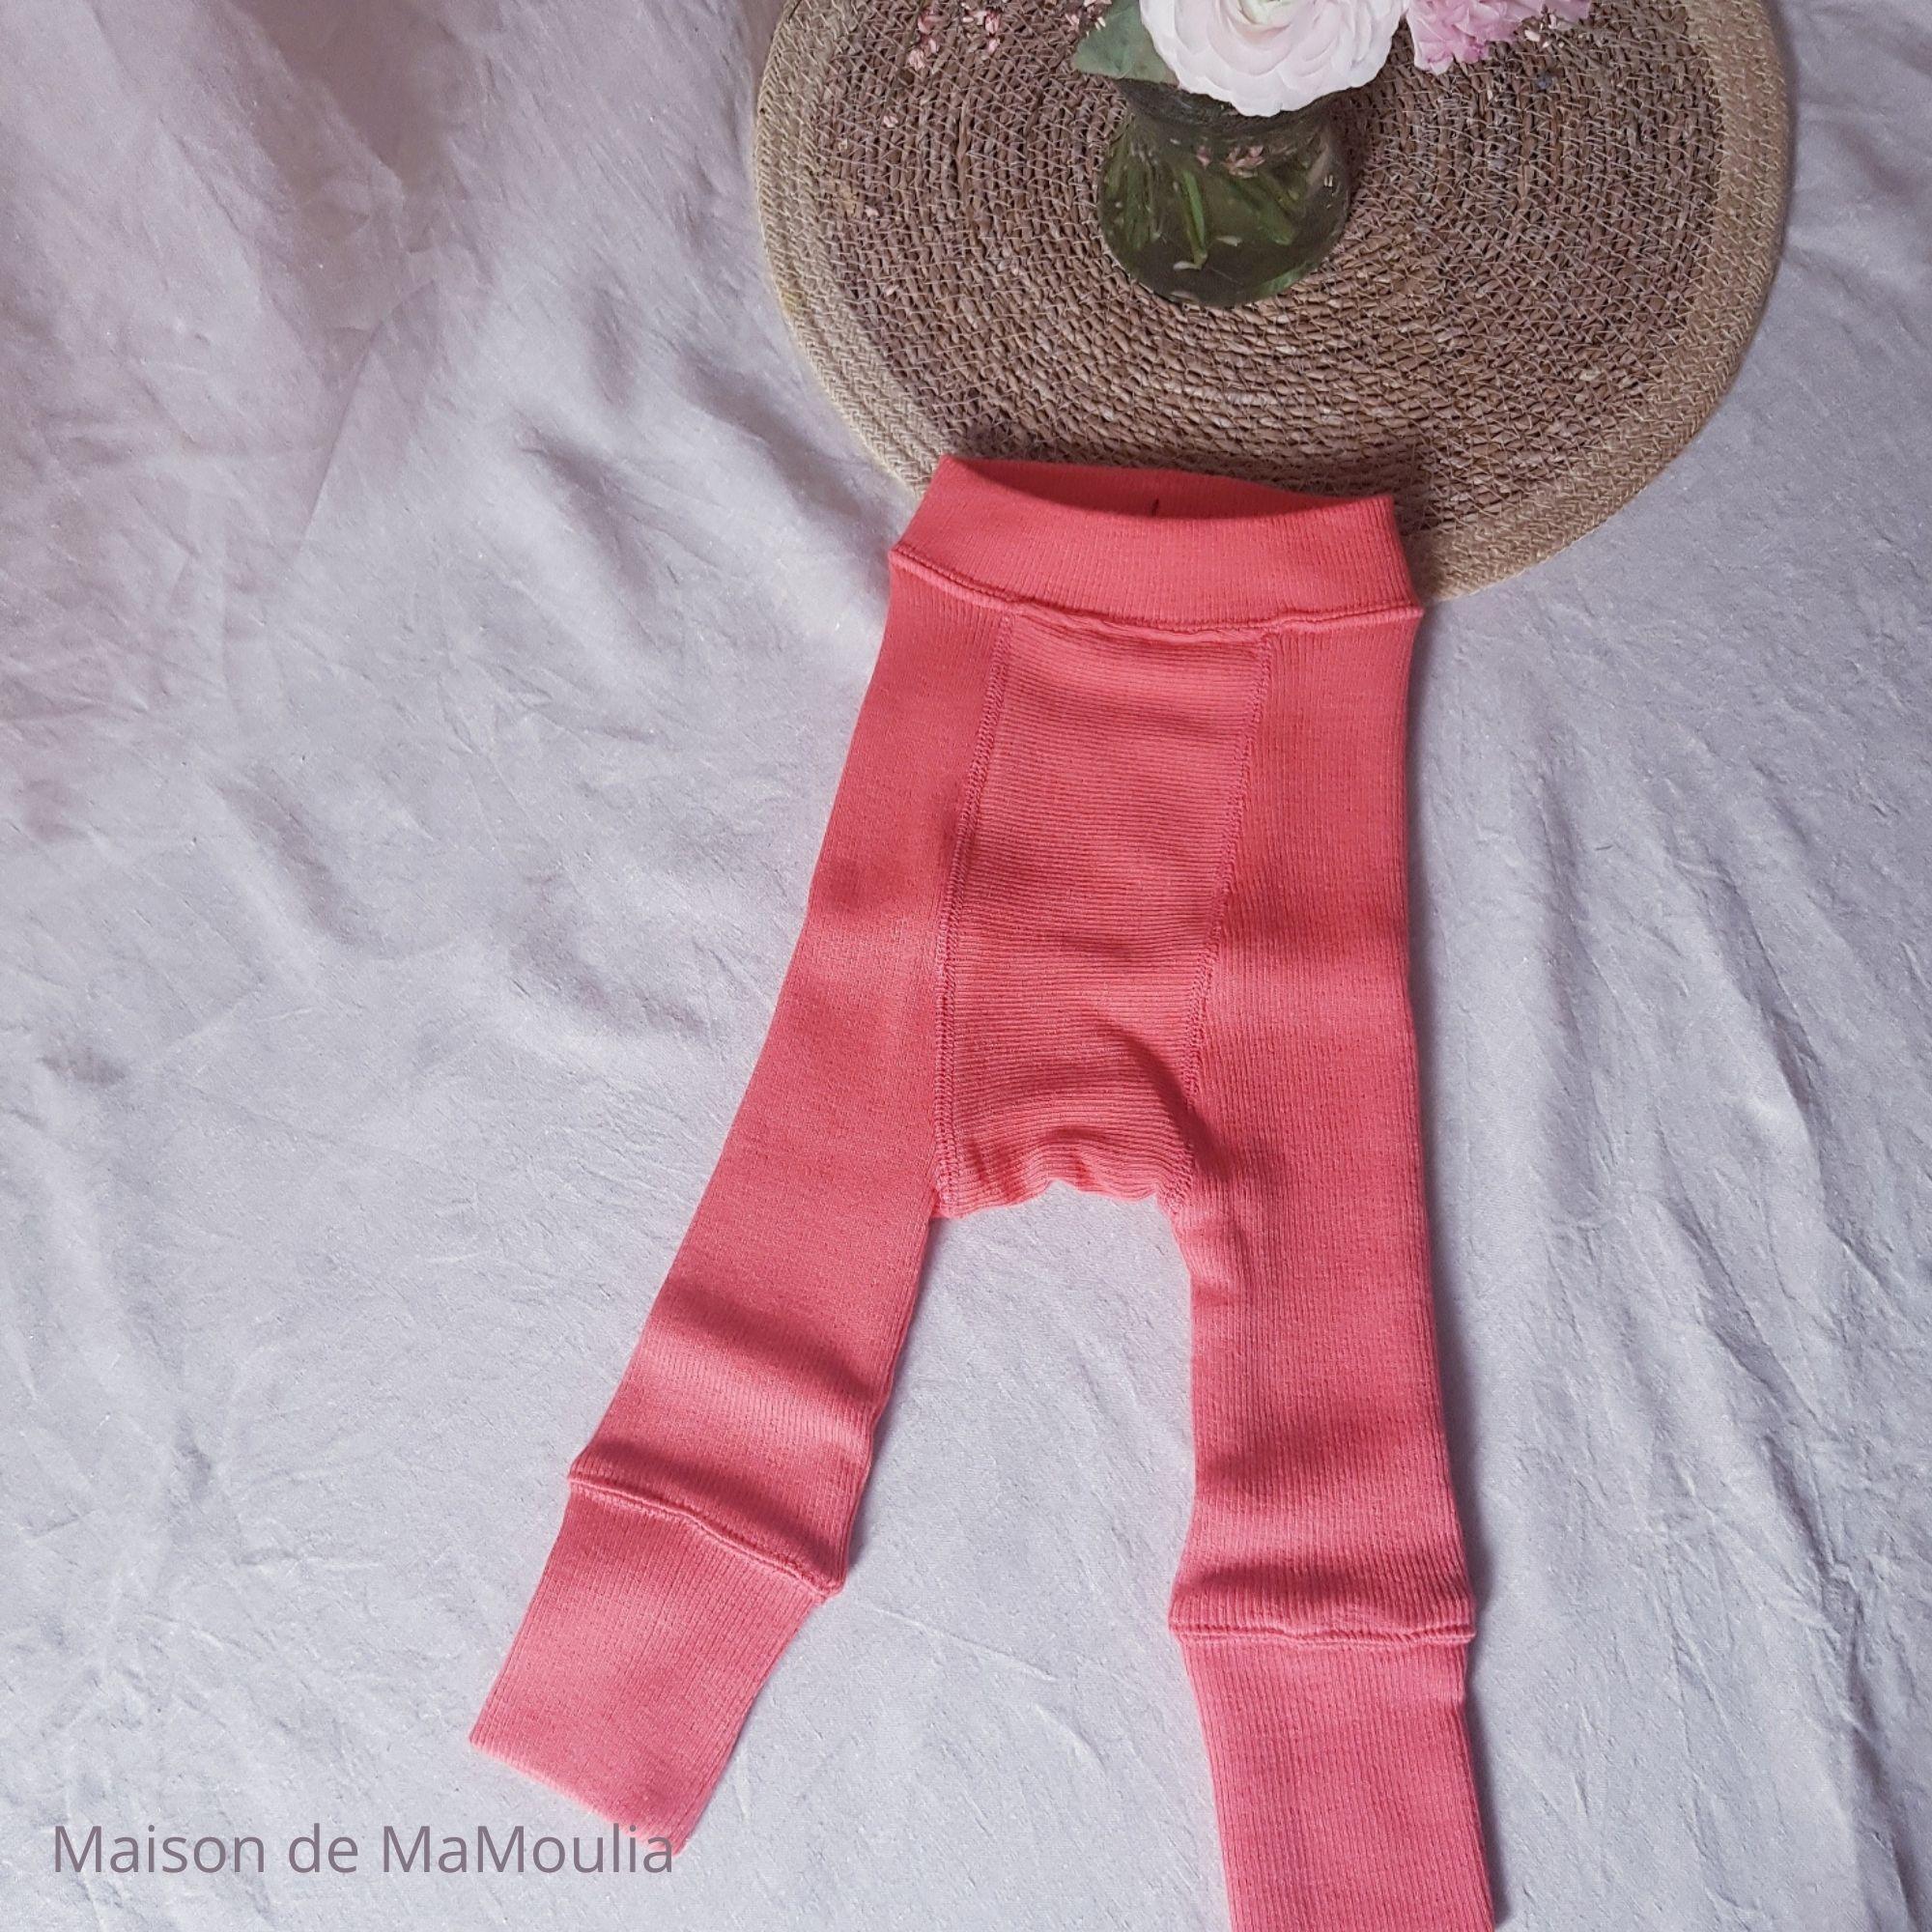 MANYMONTHS - LONGIES Pantalon Évolutif - 100% laine mérinos - Réversible - CORAL/CRANBERRY